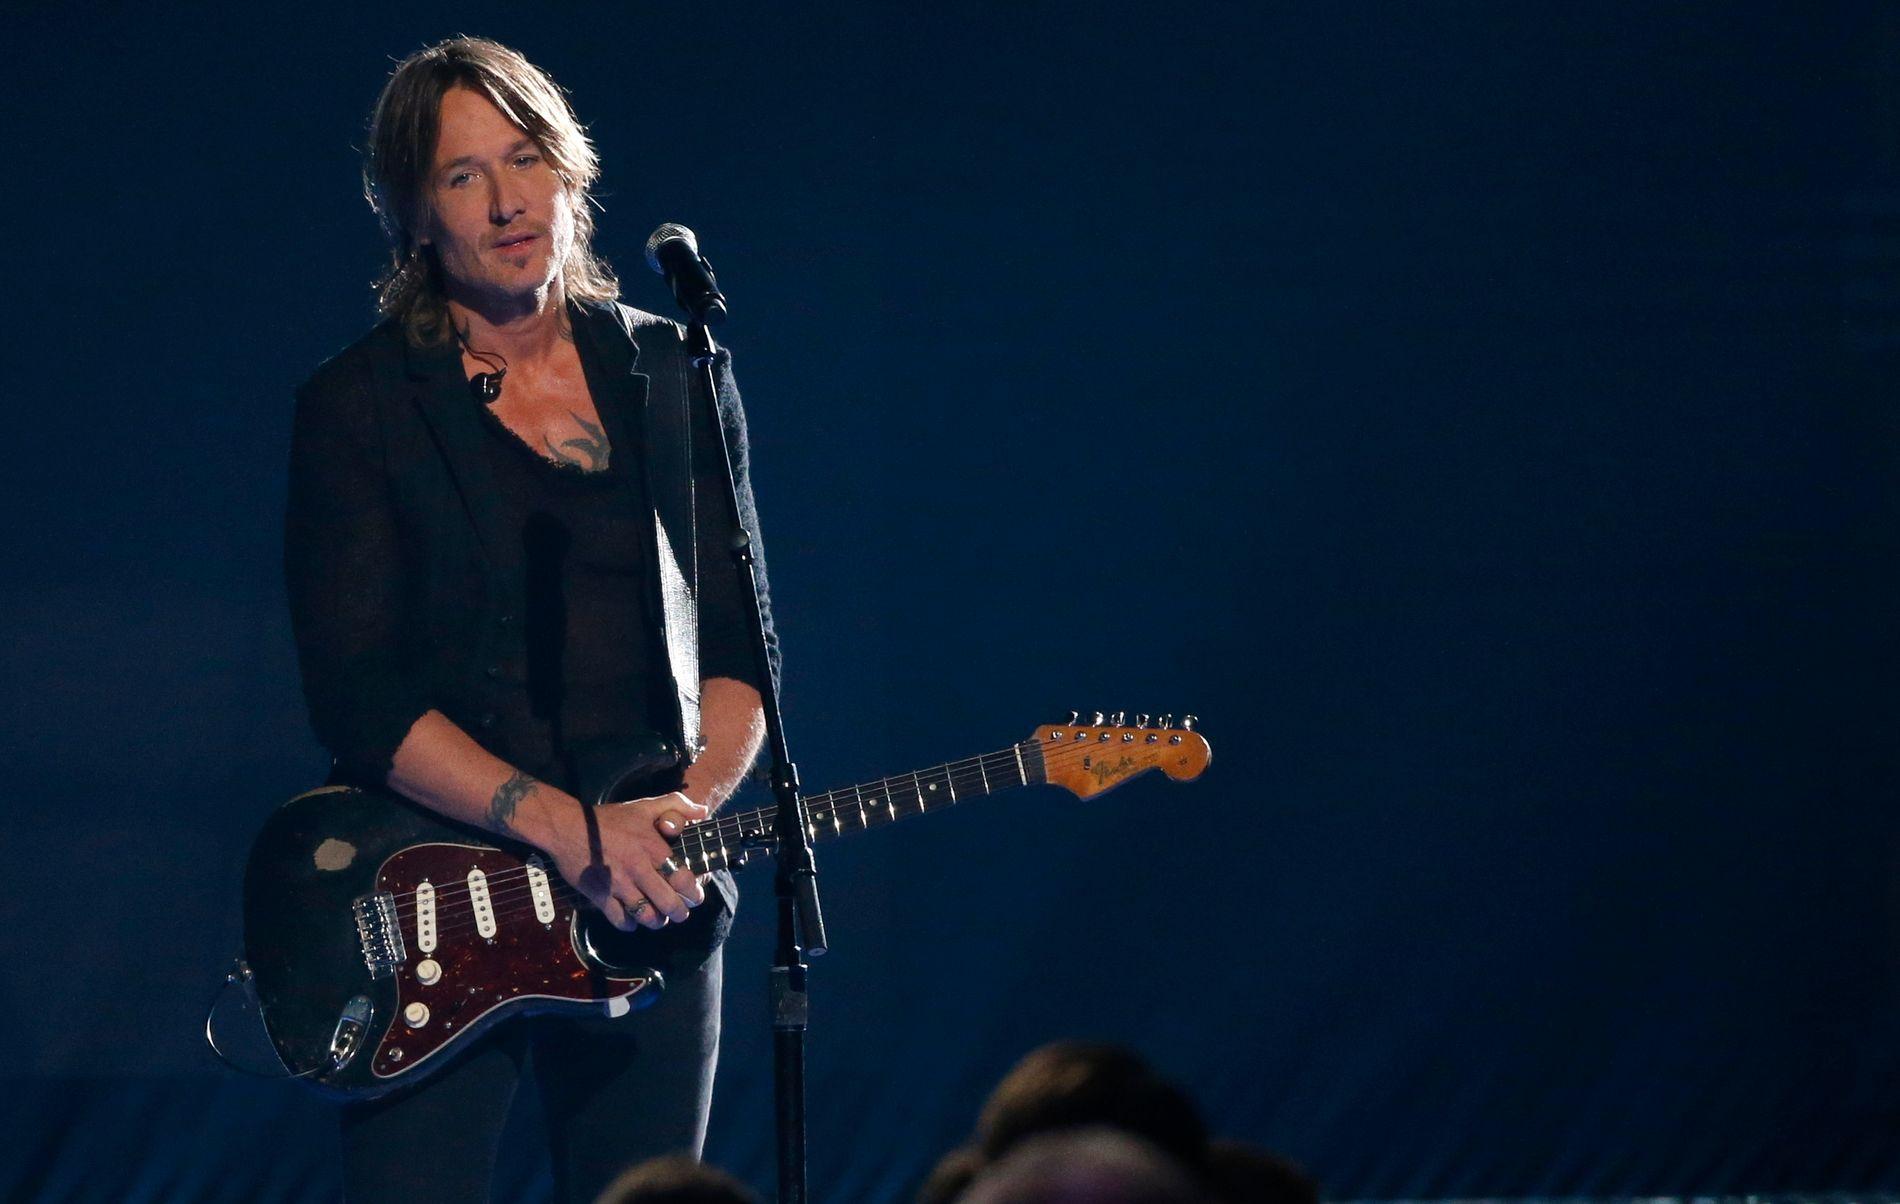 STERKT: Keith Urban på scenen i Bridgestone Arena med låten «Female».